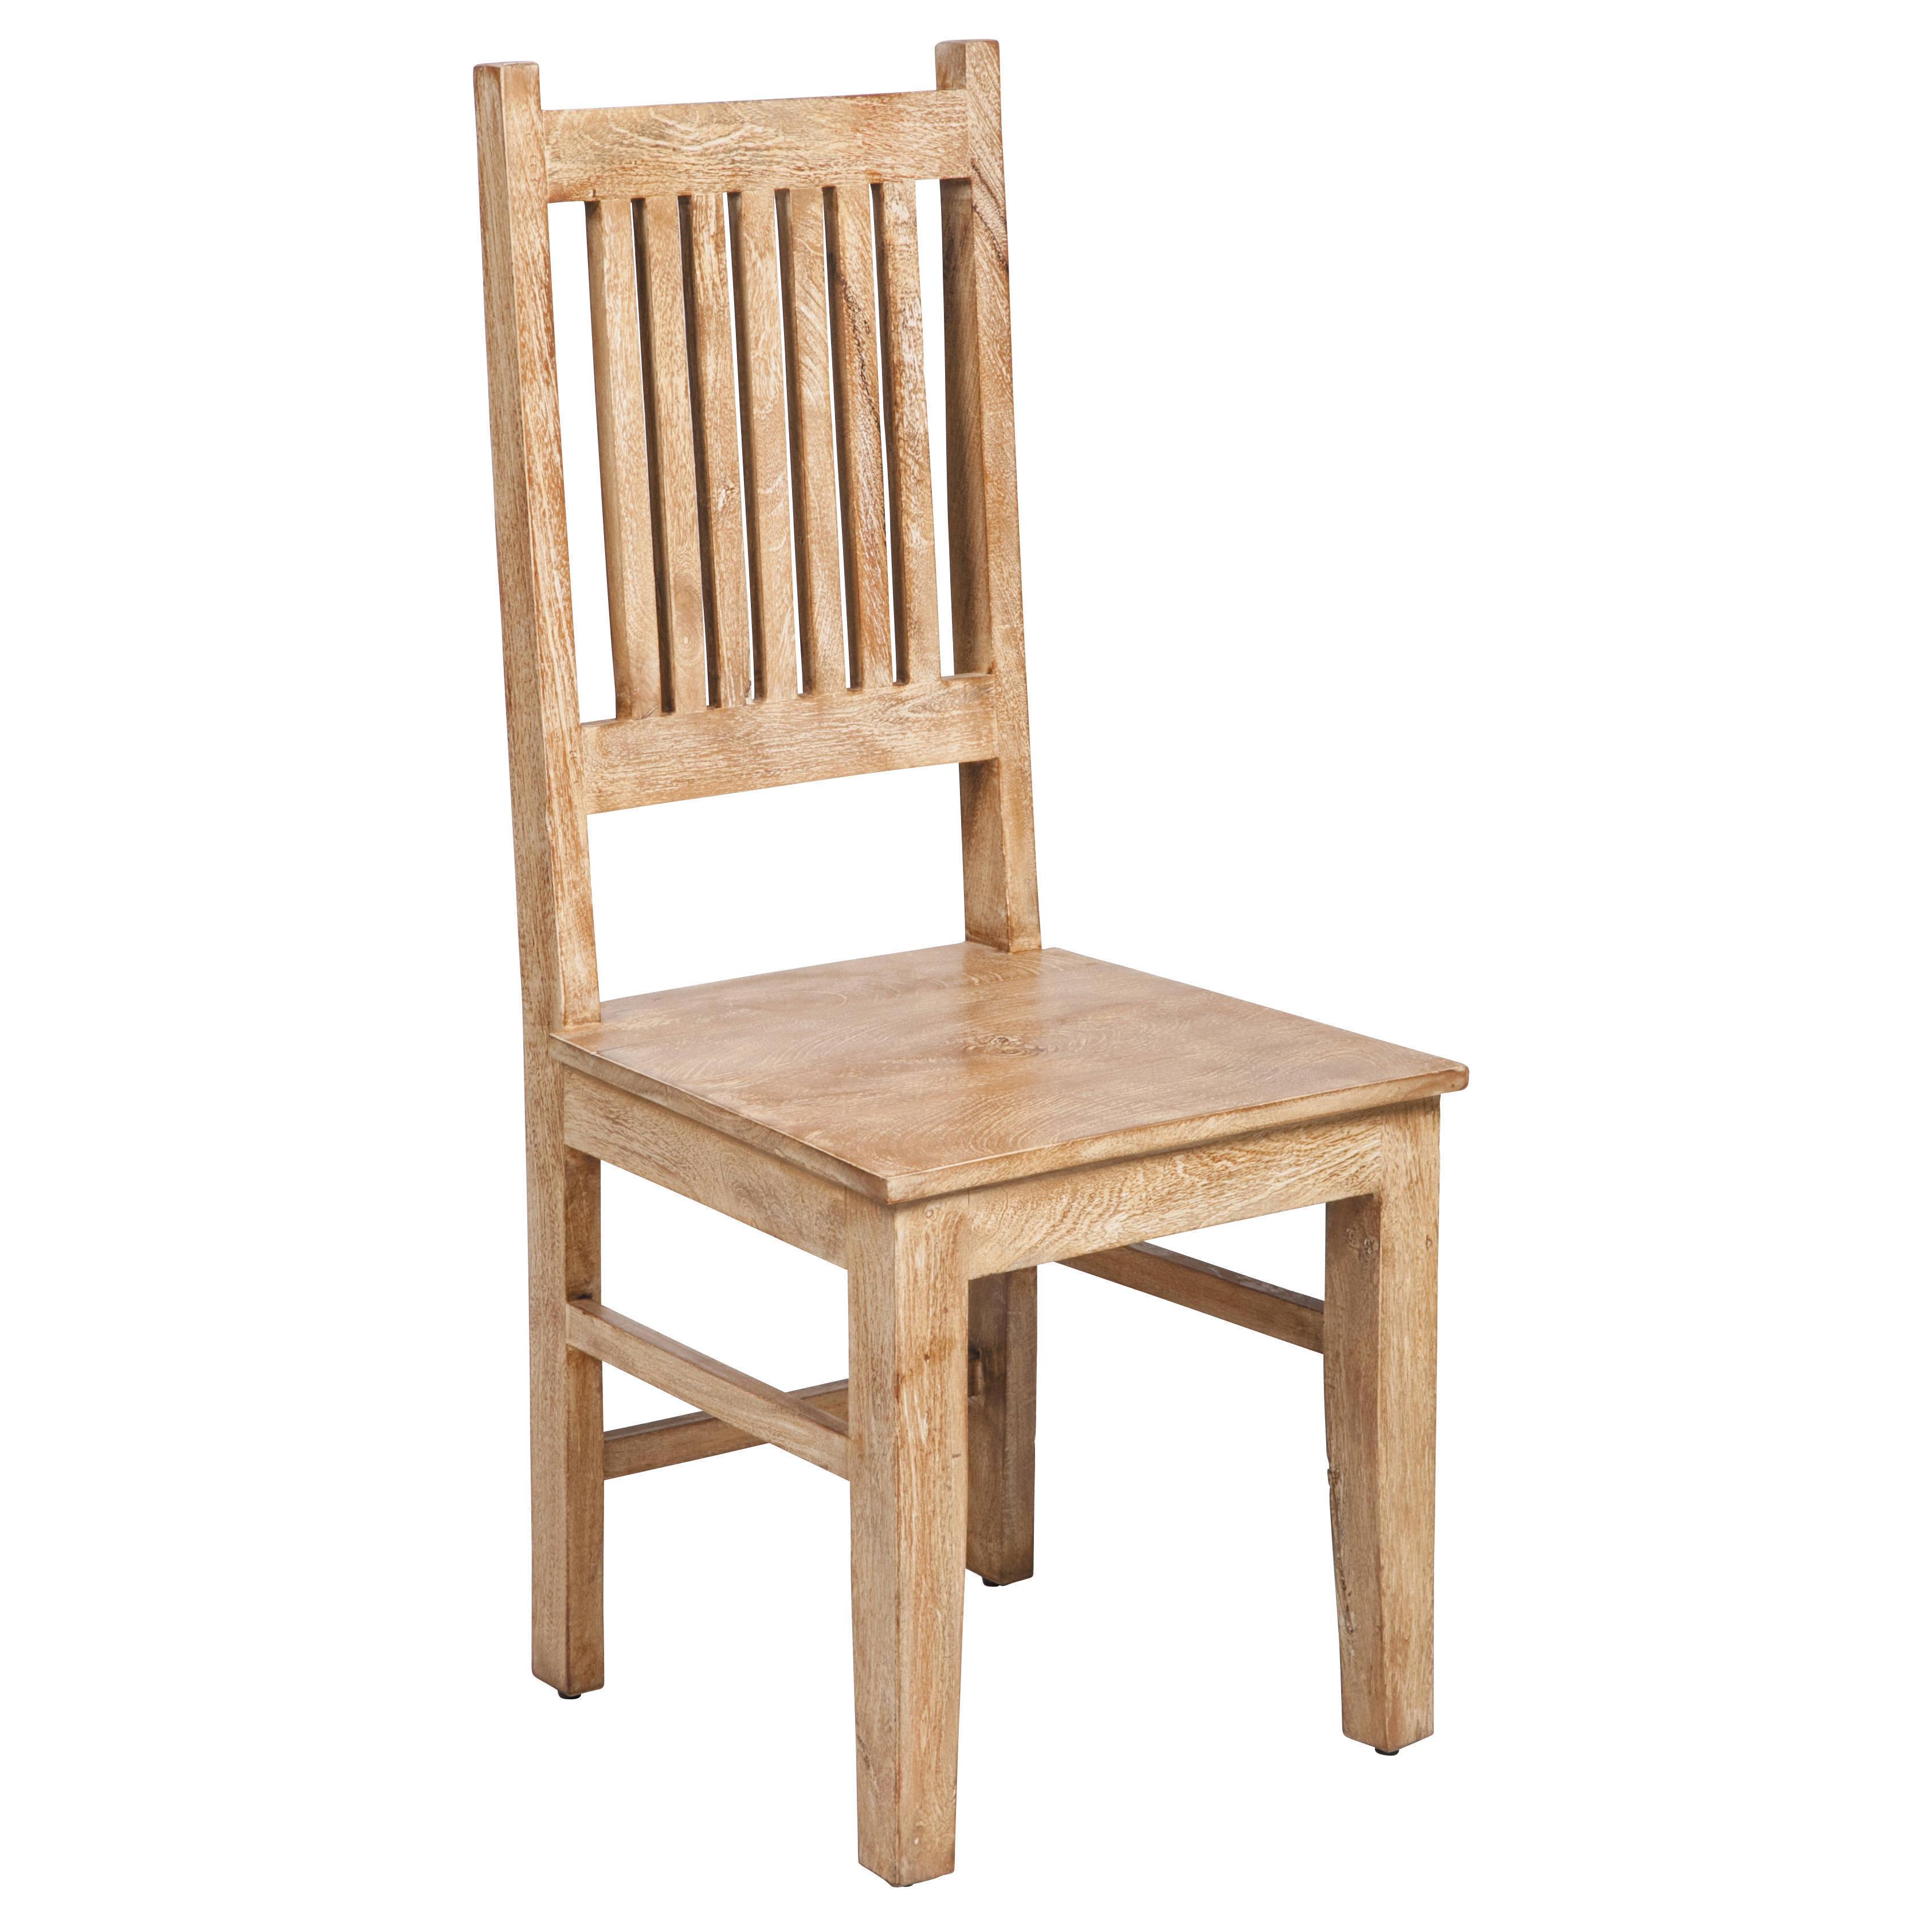 Joseph Allen Mission Mango Wood Ladder Backed Chair (Mang...